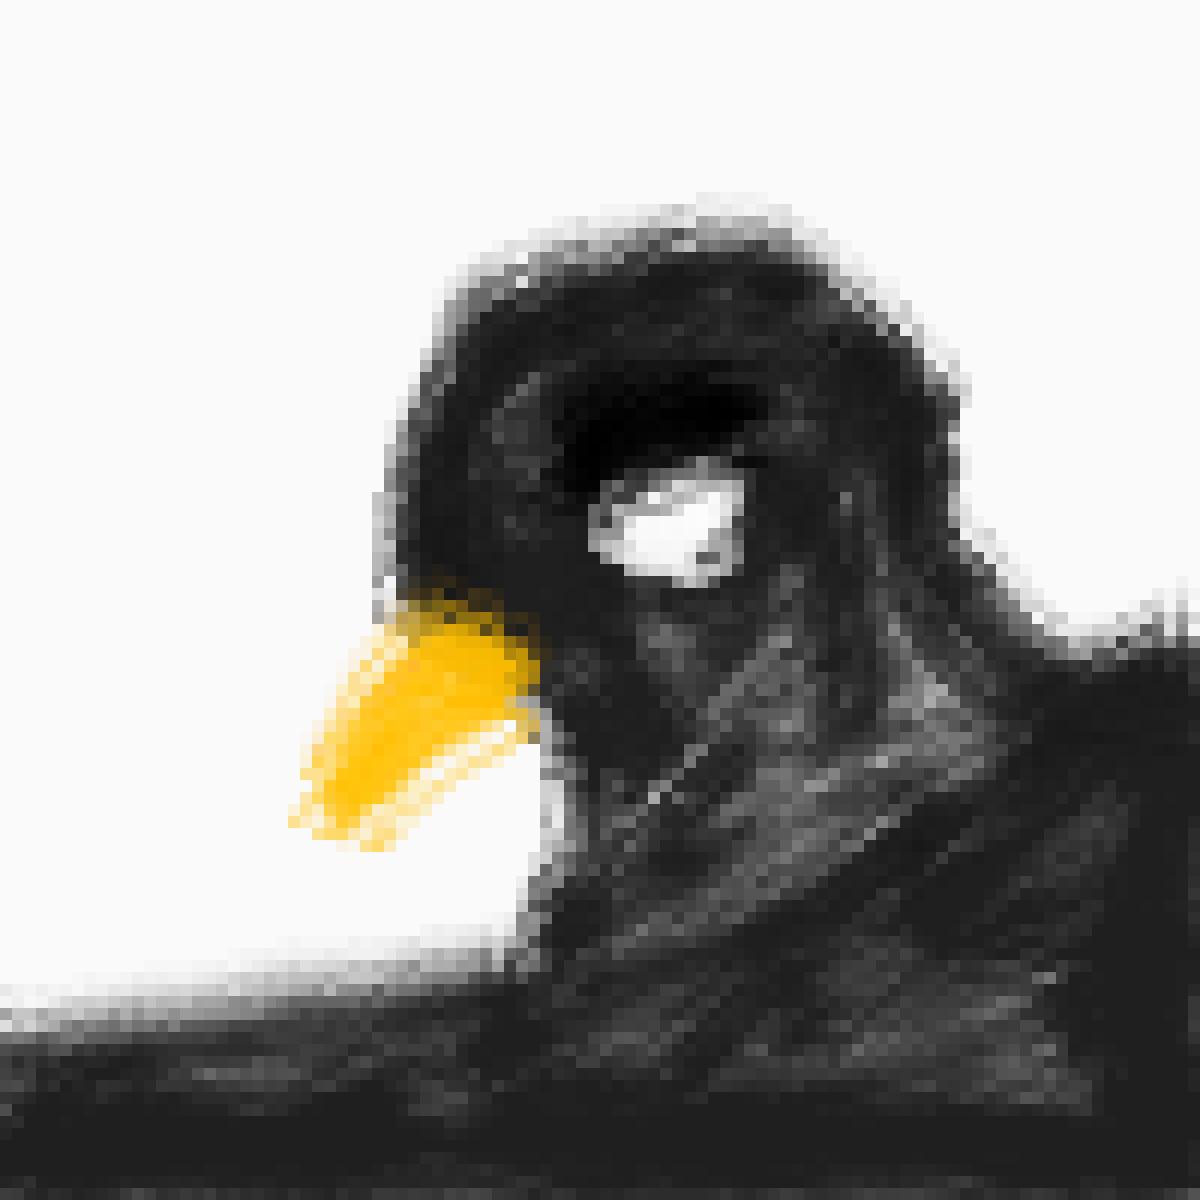 Black Bird by Bellablossom06